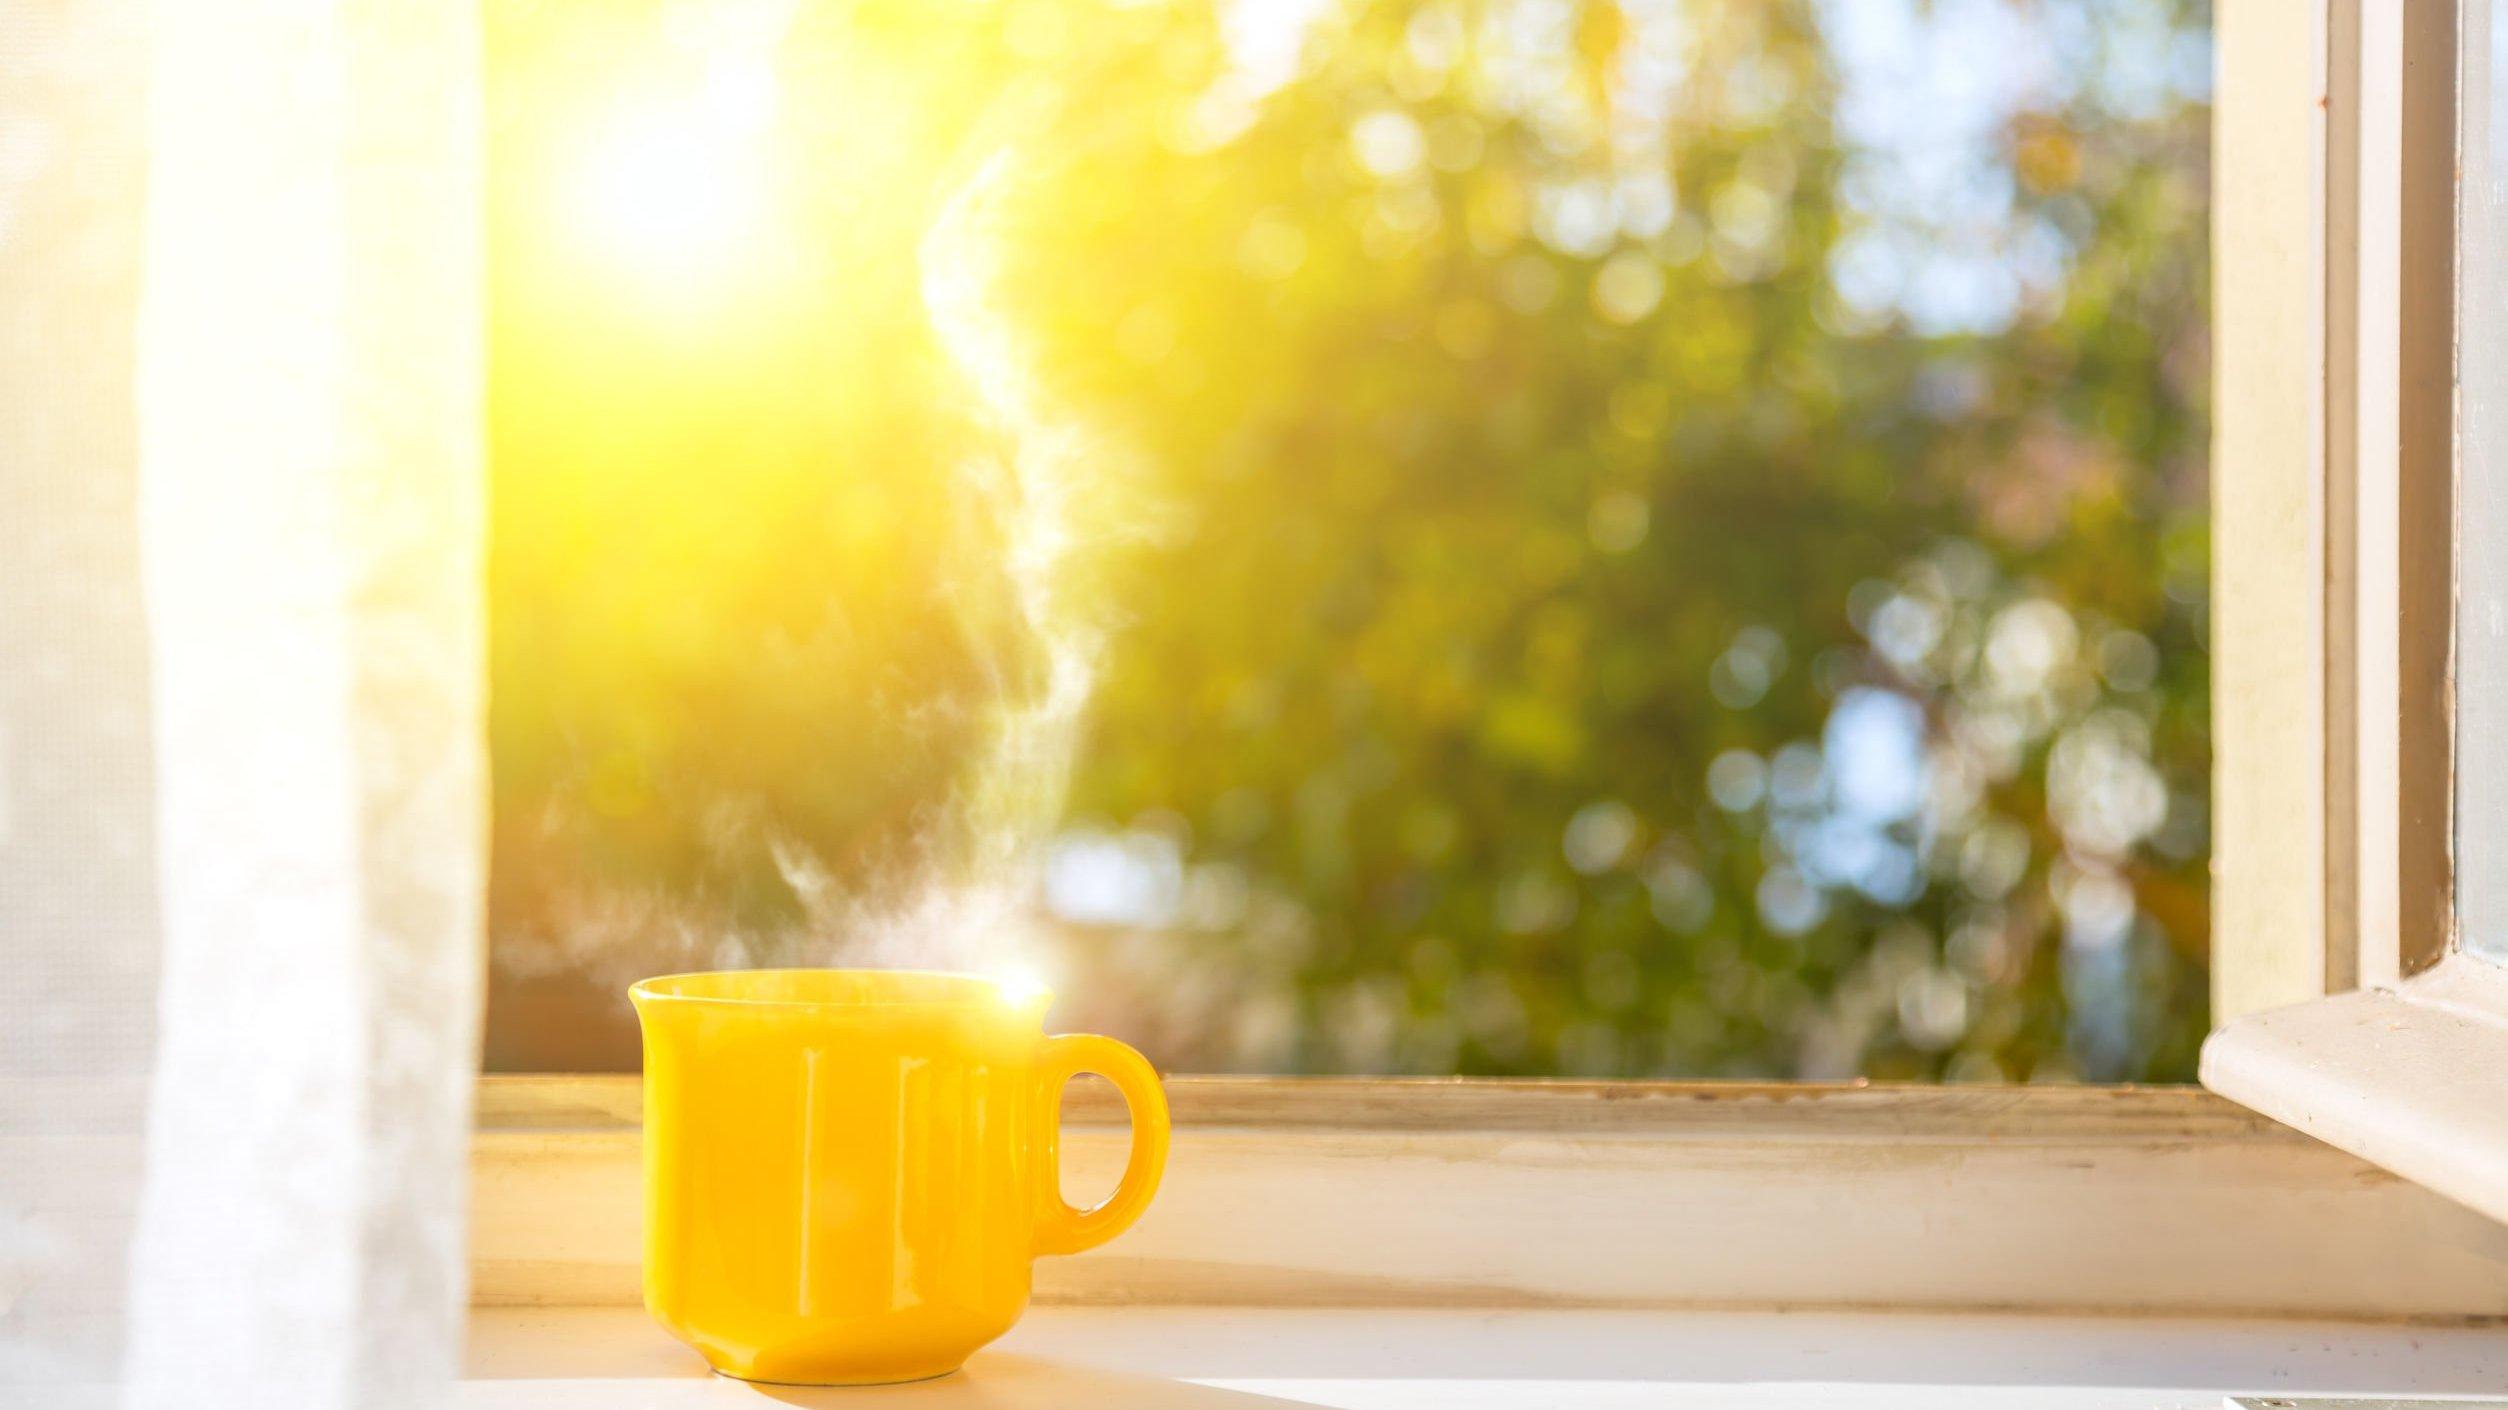 Xícara amarela próxima de janela aberta.